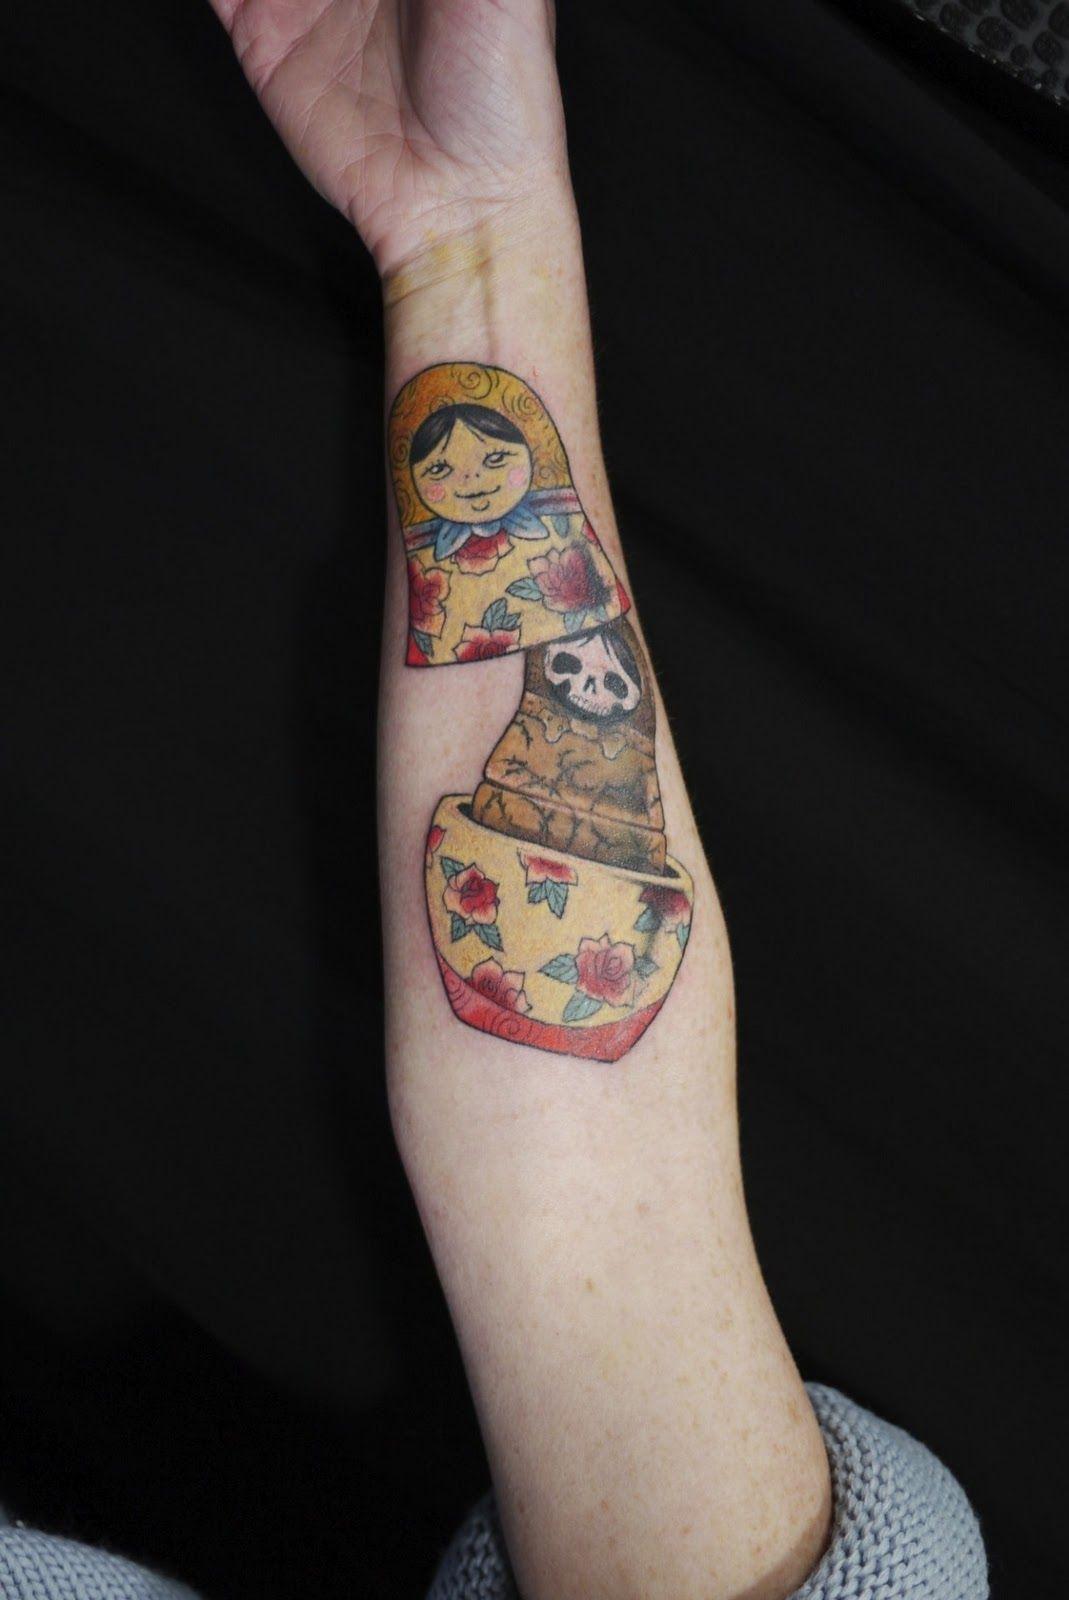 Porte jartel tatouage galerie tatouage - Tatouage famille homme ...